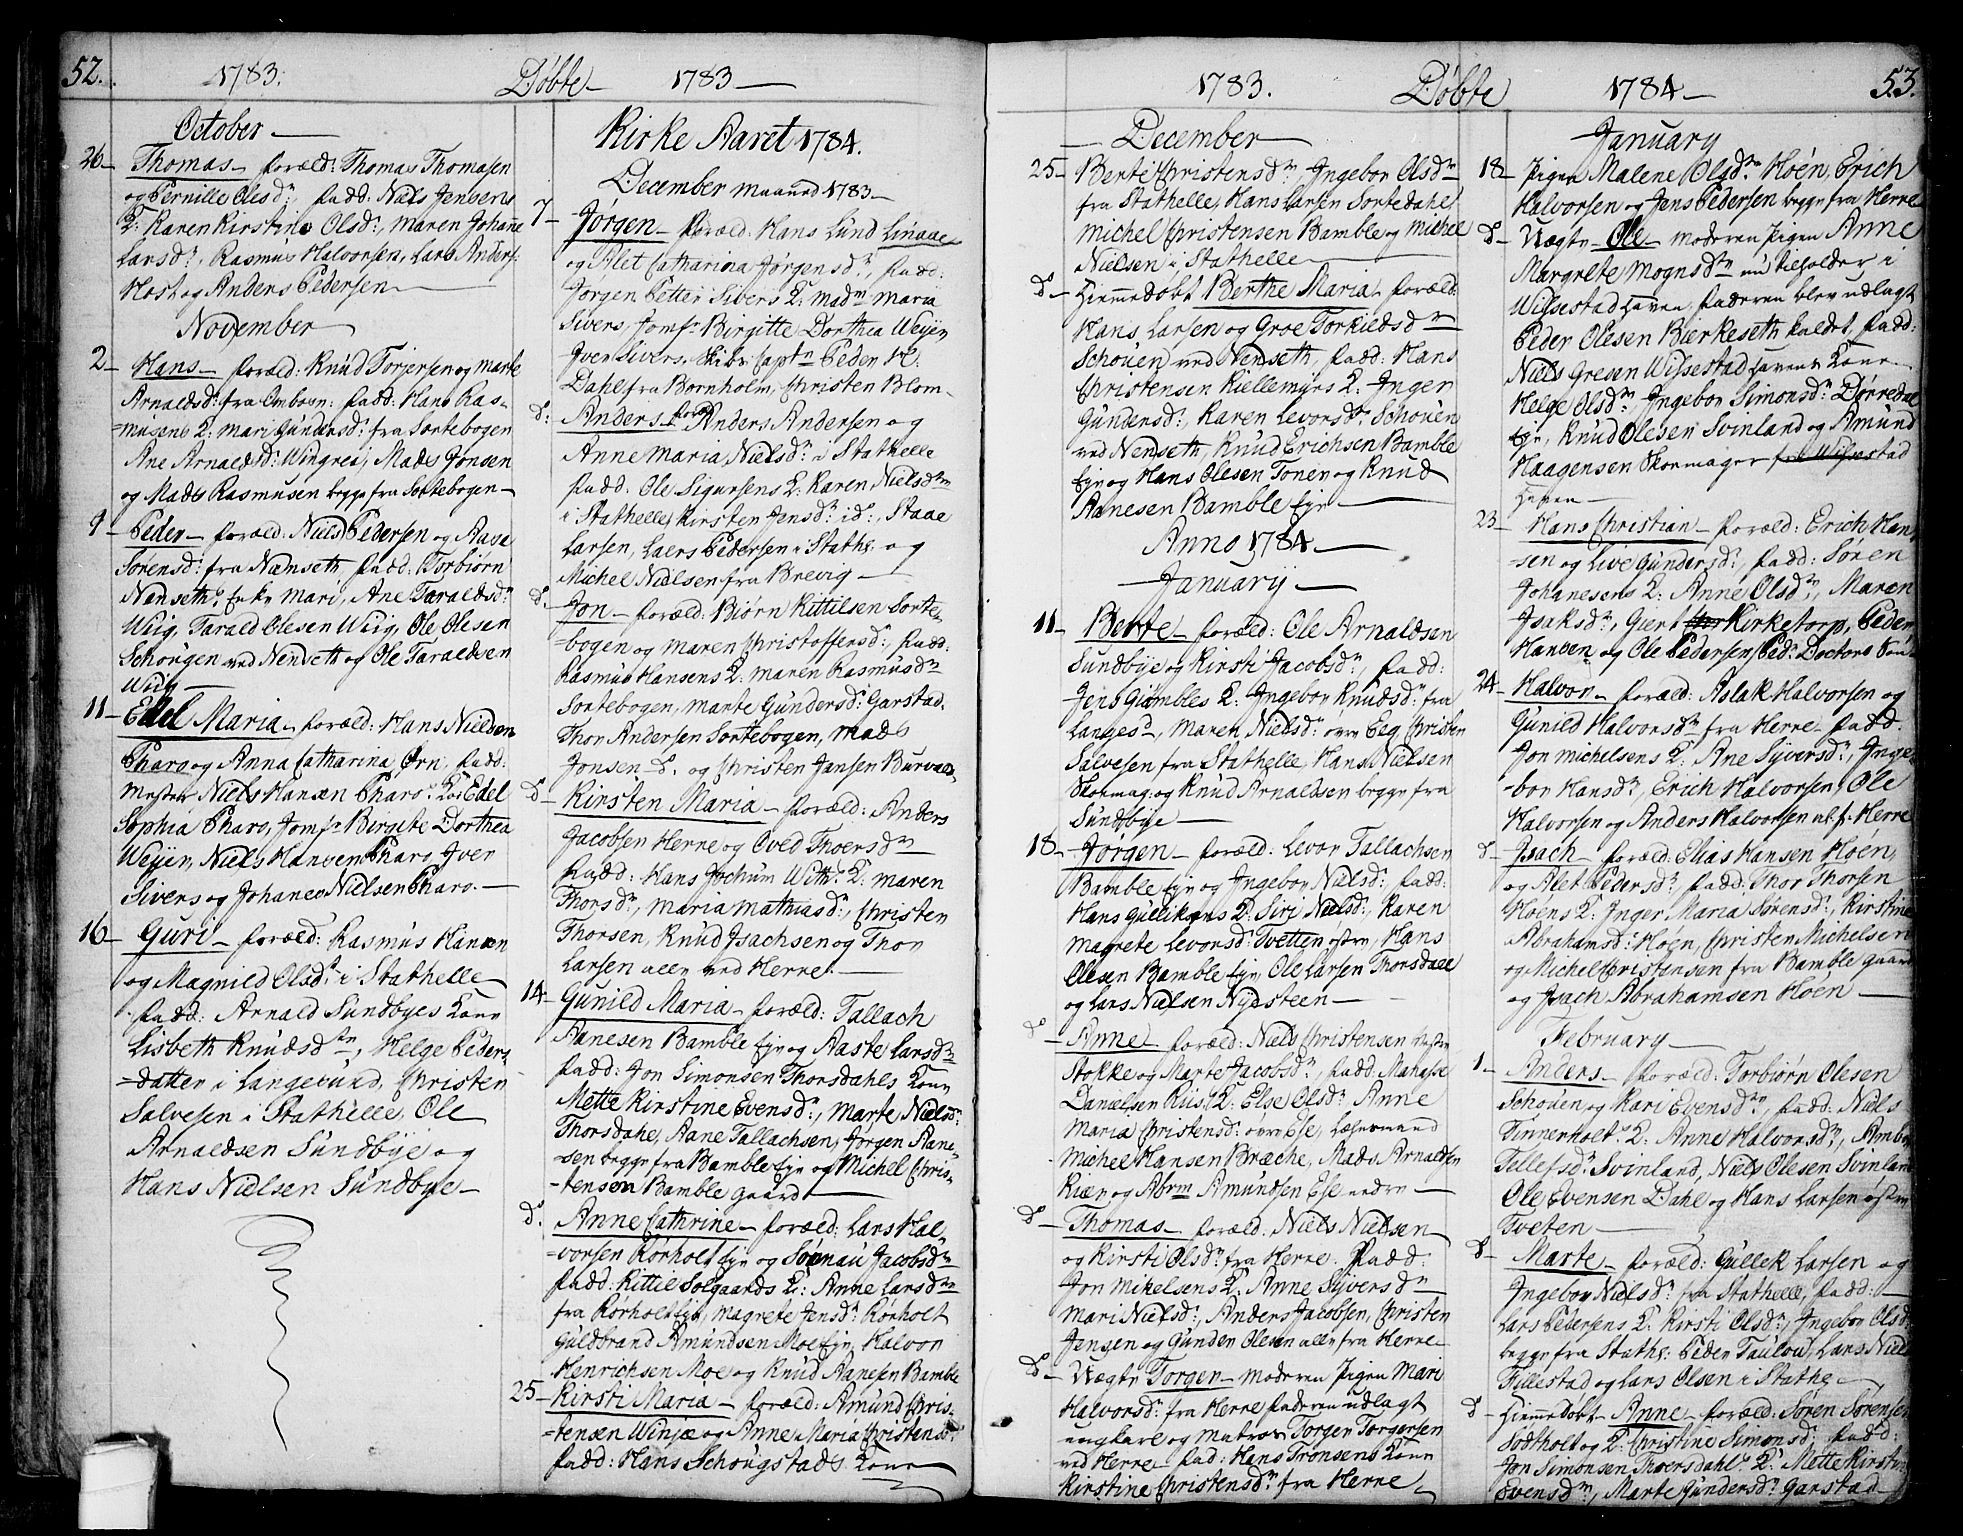 SAKO, Bamble kirkebøker, F/Fa/L0002: Ministerialbok nr. I 2, 1775-1814, s. 52-53